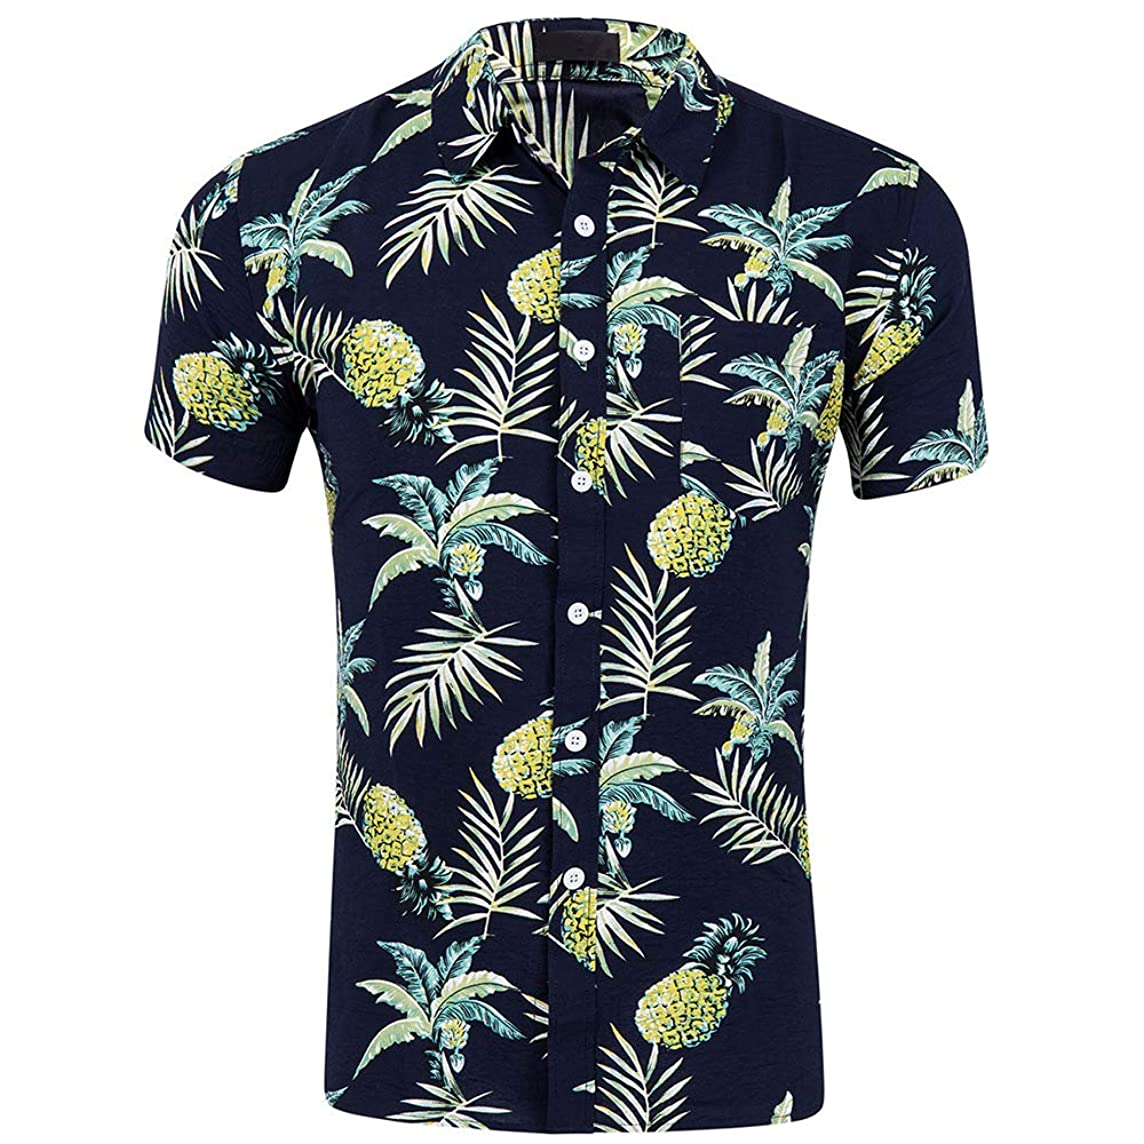 CATERTO Men's Short Sleeve Standard-Fit 100% Cotton Button Down Casual Pineapple Hawaiian Shirt